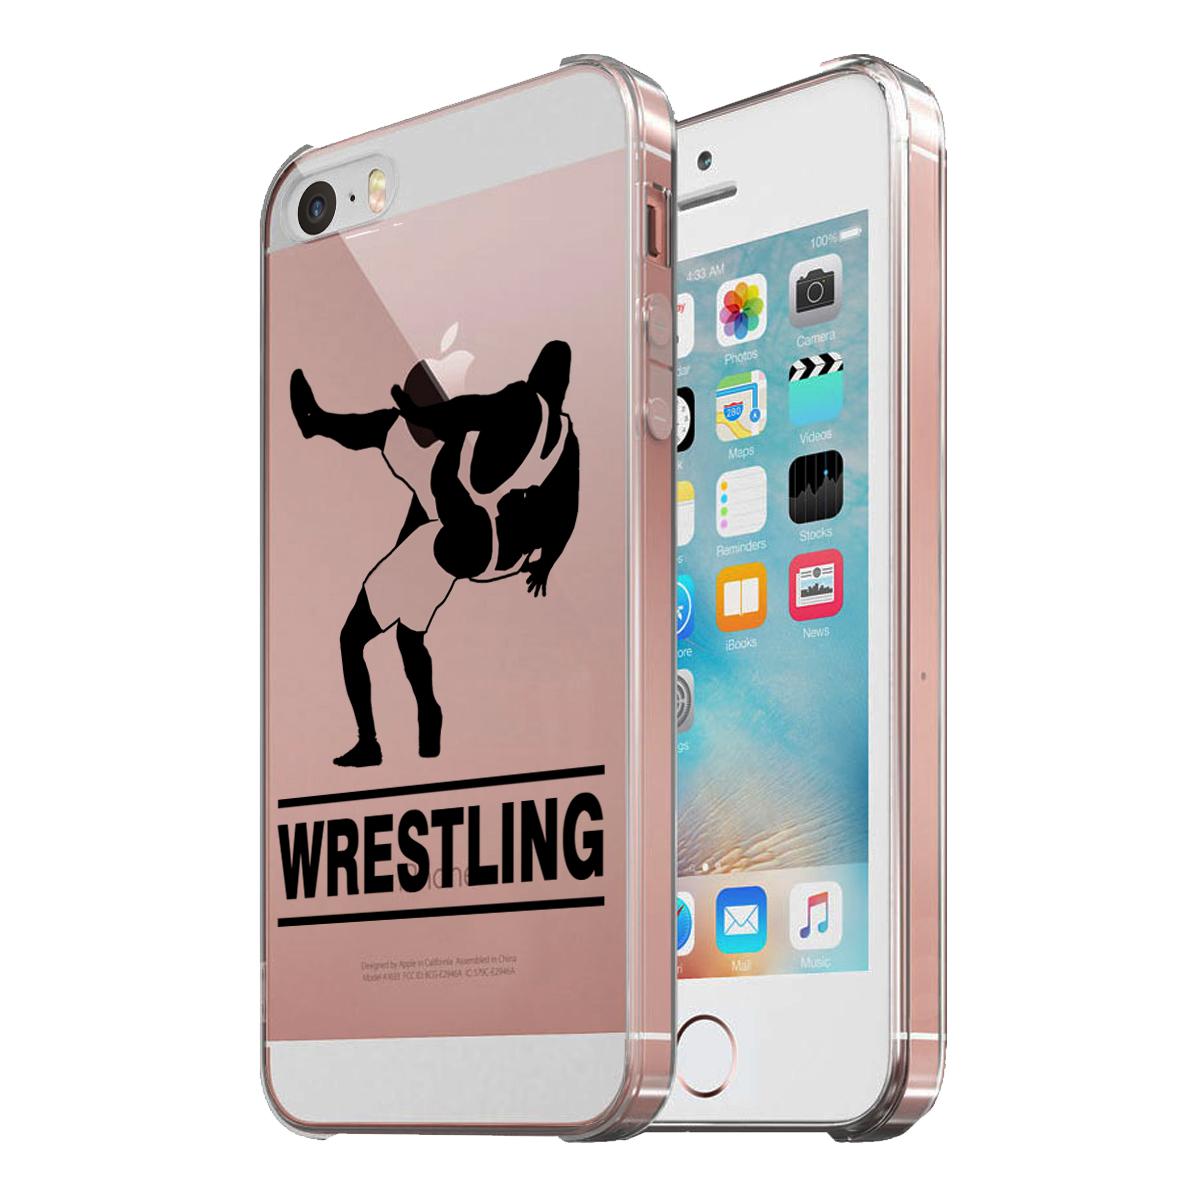 KuzmarK Clear Cover Case fits iPhone SE & iPhone 5 - Wrestling Match